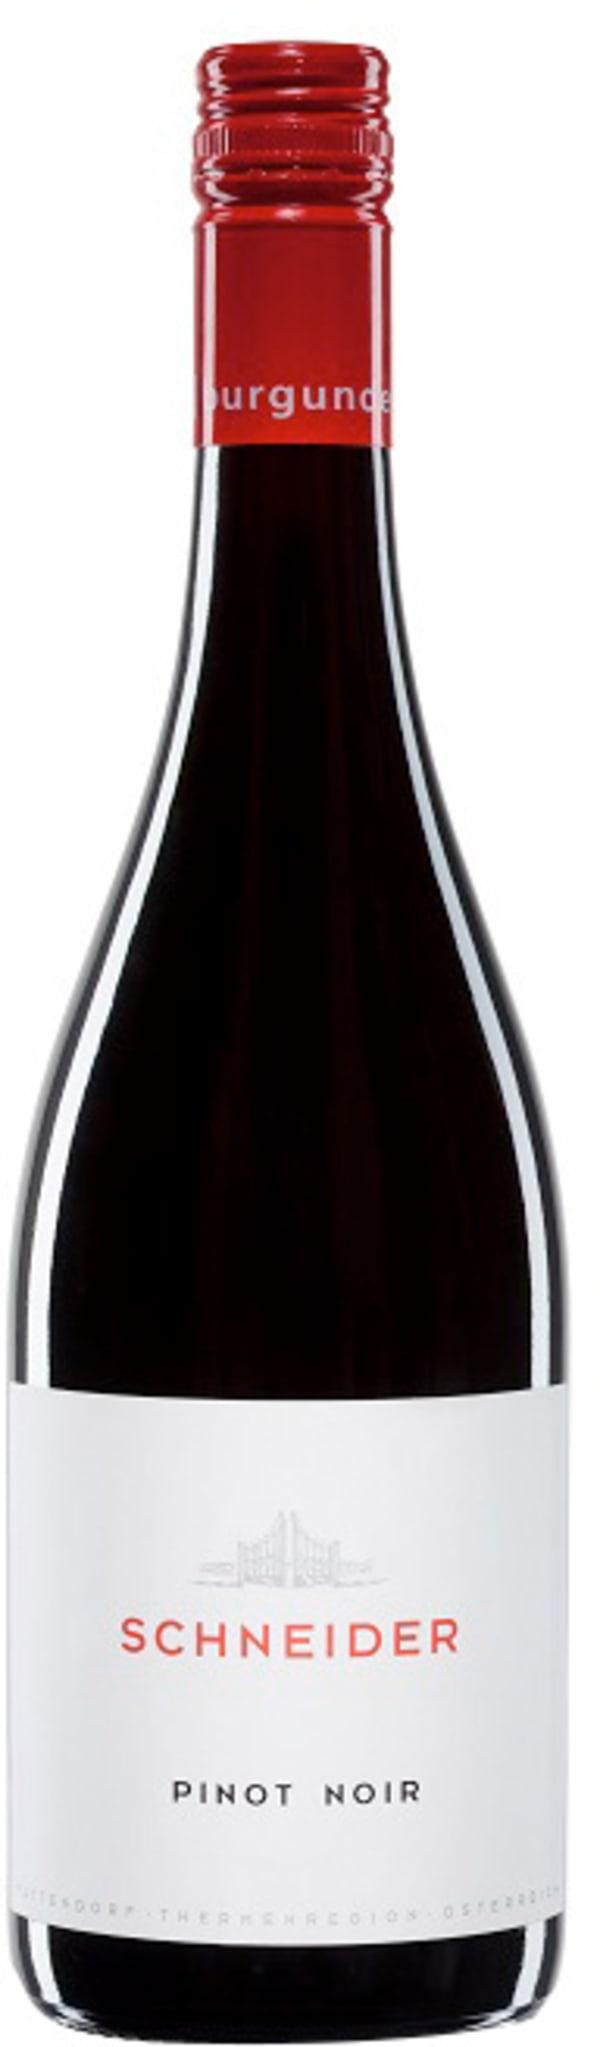 Schneider Tattendorf Pinot Noir 2017